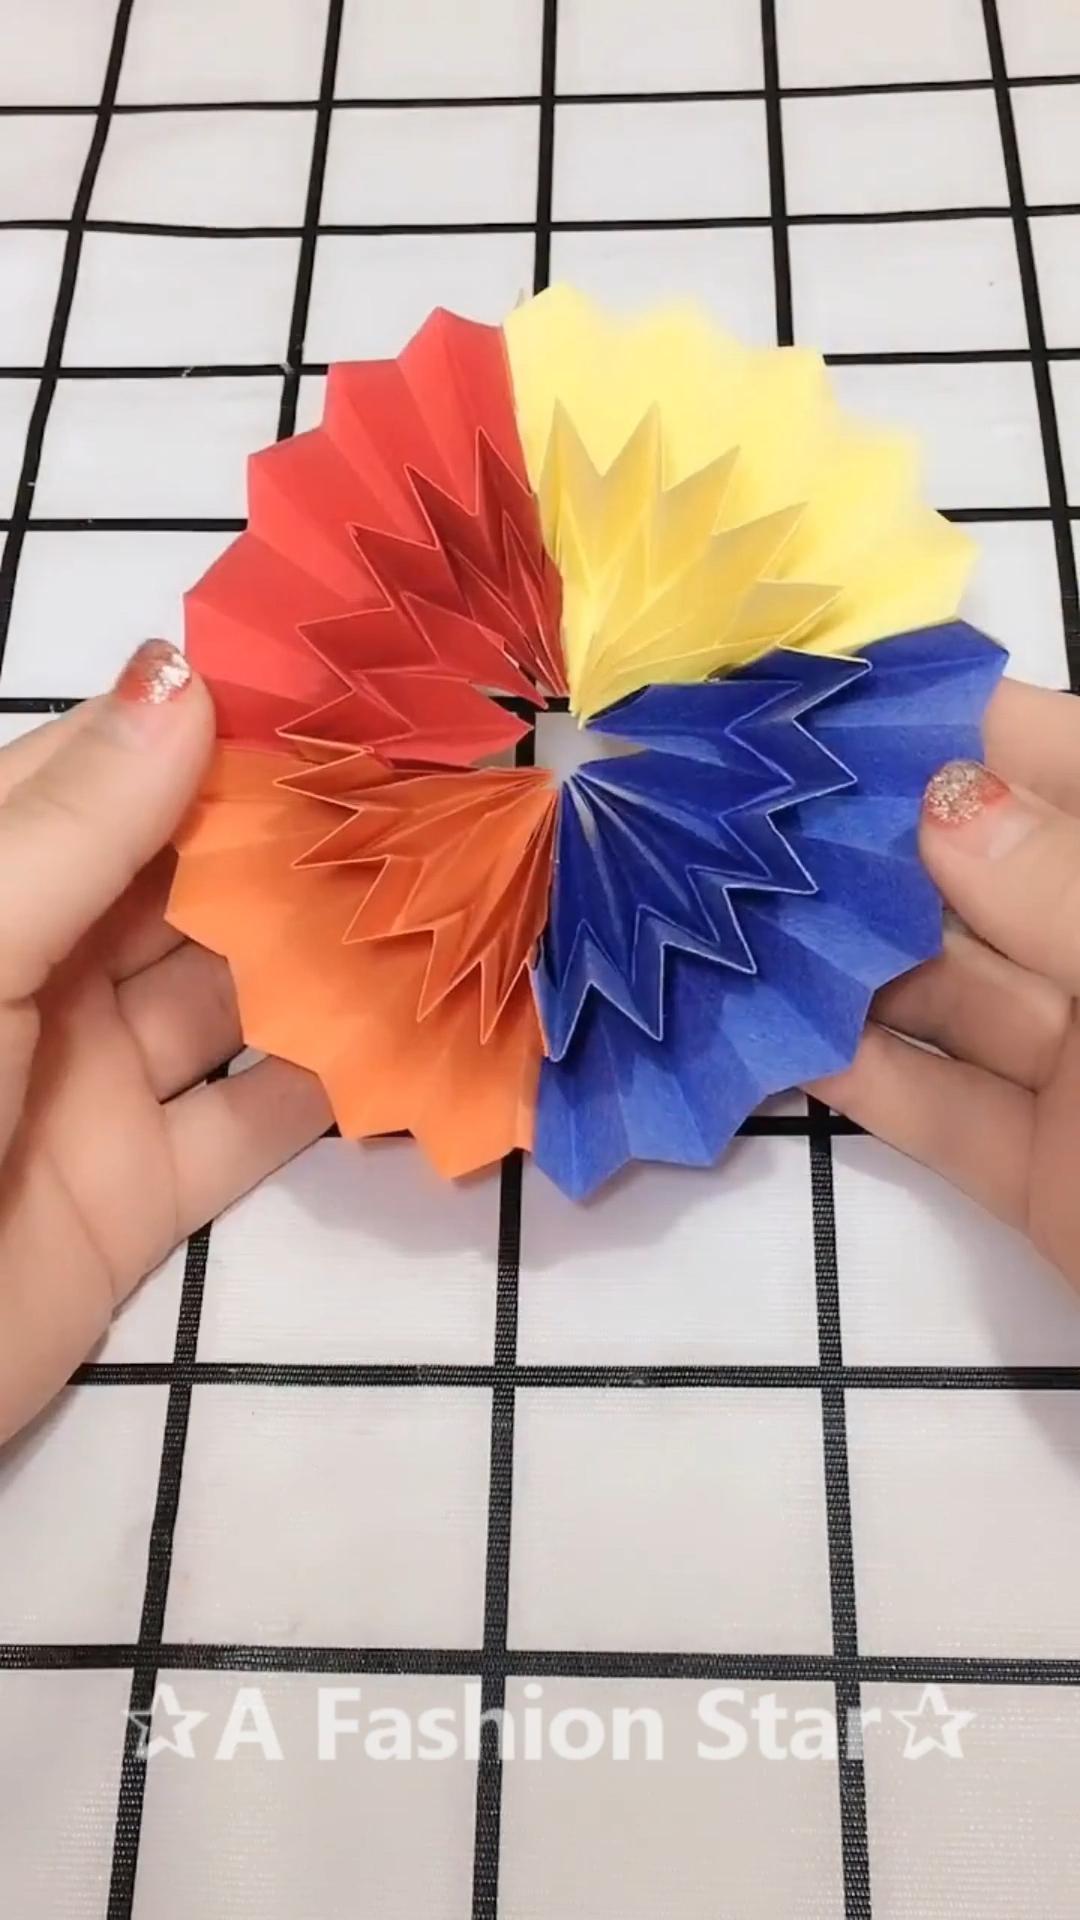 Origami Diy A Fashion Star Video Paper Crafts Origami Origami Crafts Paper Crafts Diy